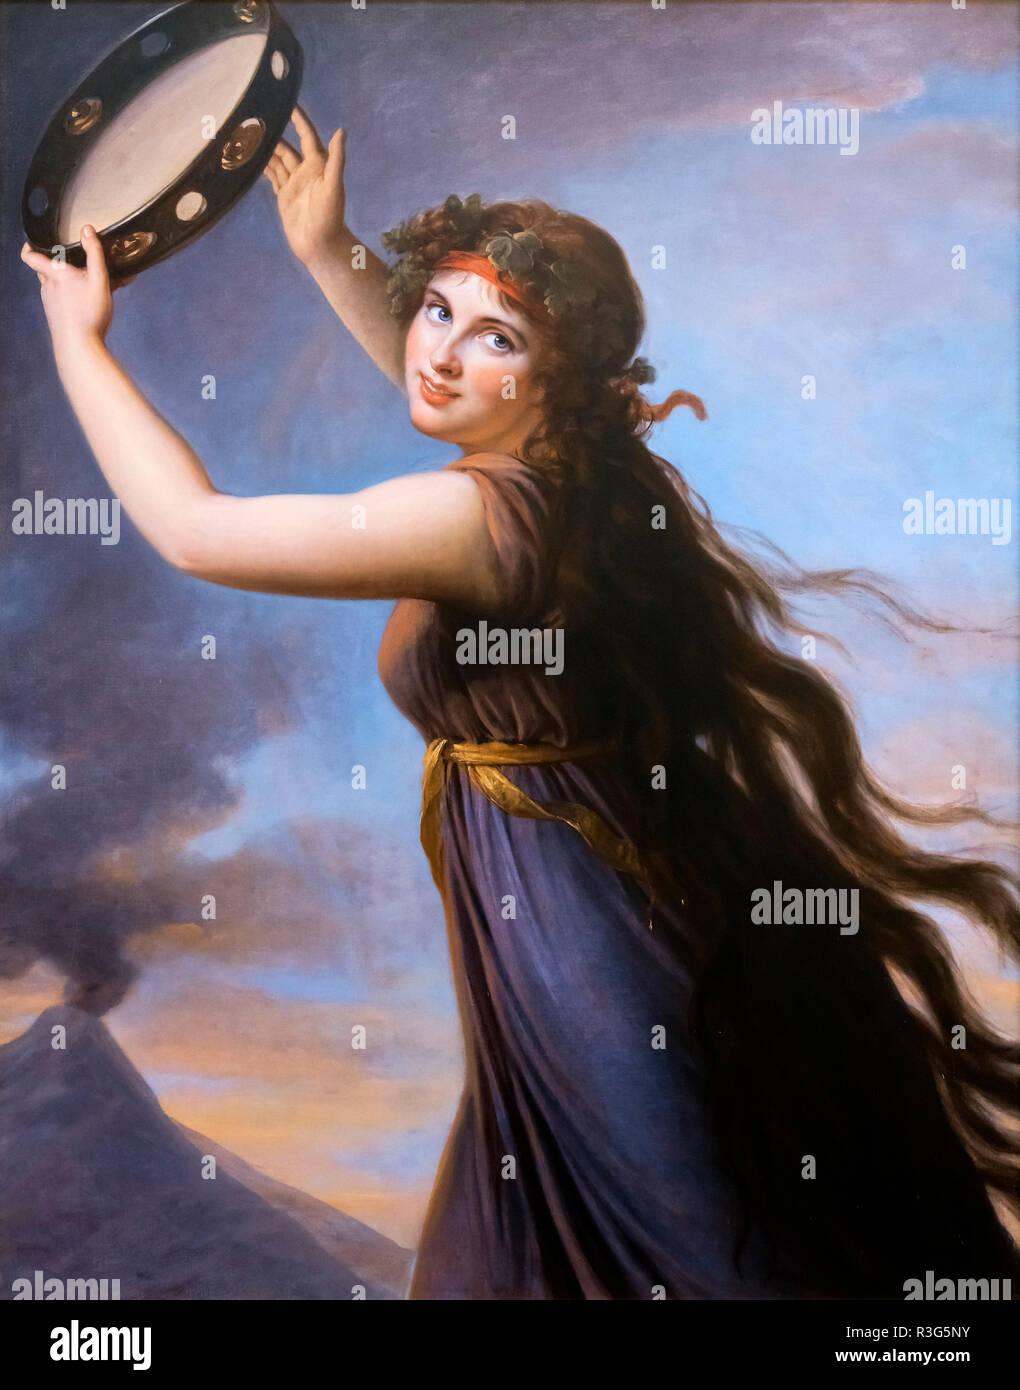 Lady Emma Hamilton (1765-1815). Retrato titulado 'Lady Hamilton como Bachante' por Élisabeth Vigée Le Brun (1755-1842), óleo sobre lienzo, 1790-92 Imagen De Stock